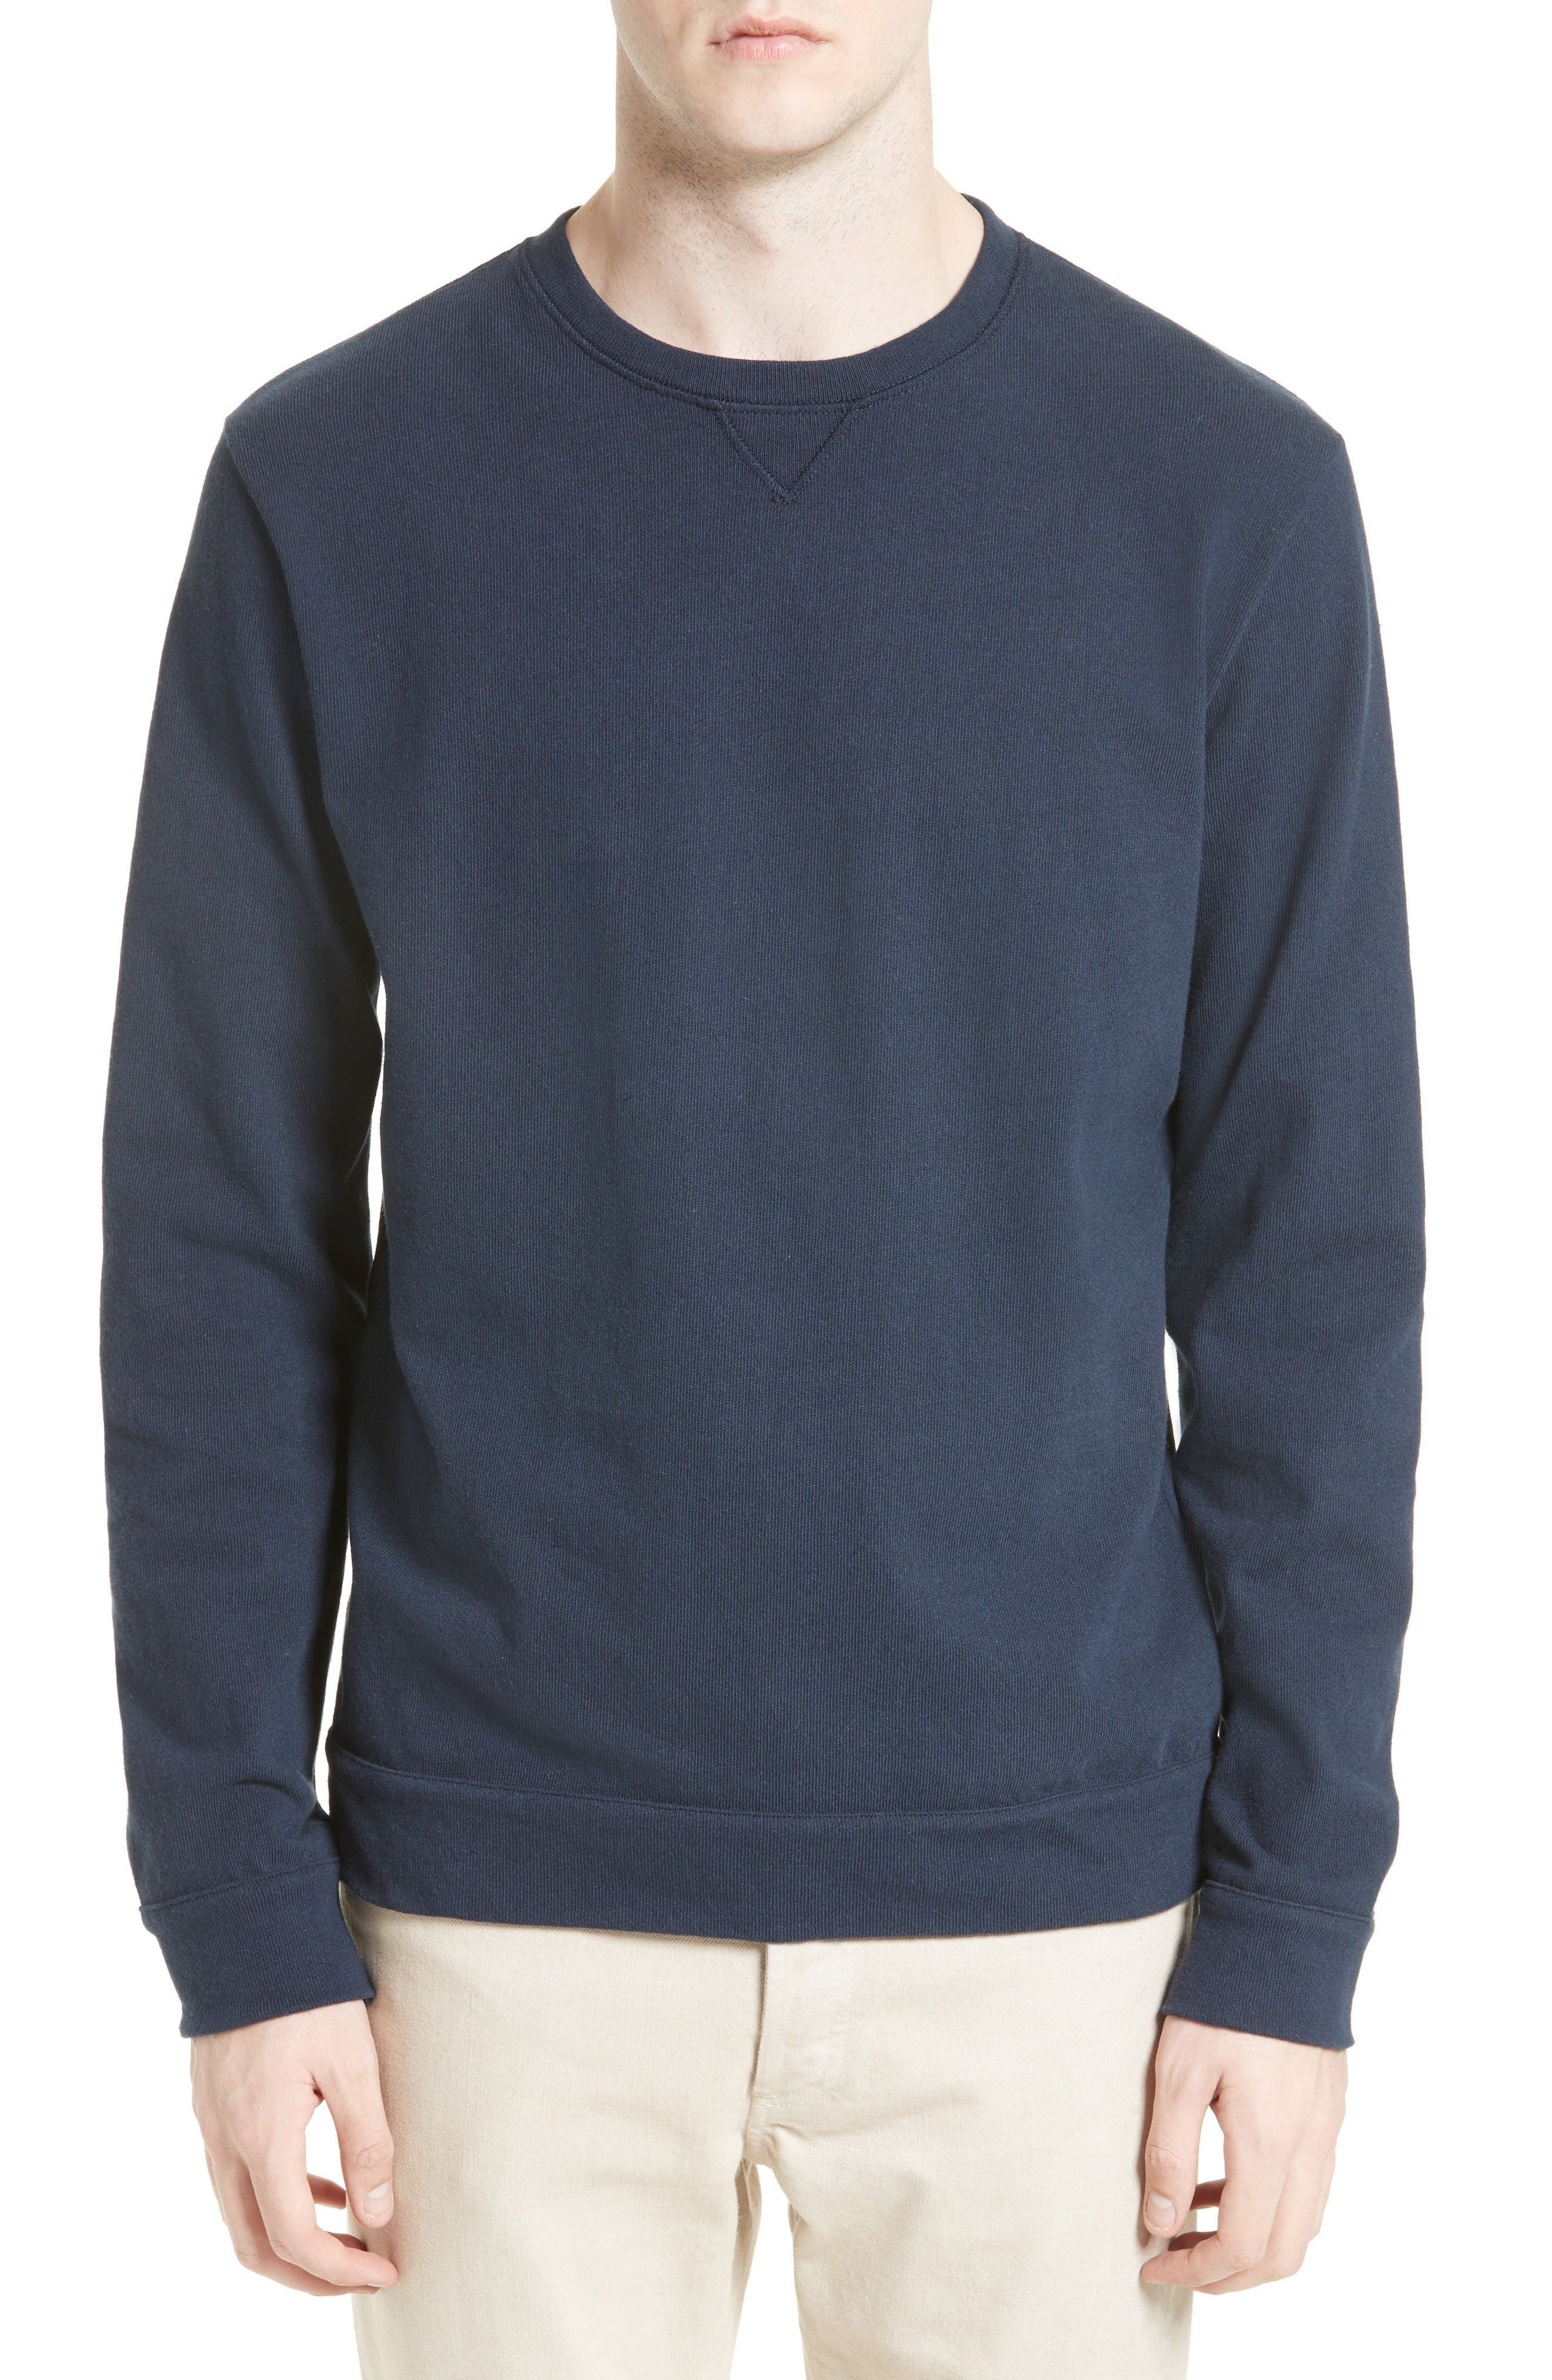 Hike Sweatshirt,                         Main,                         color, Blue